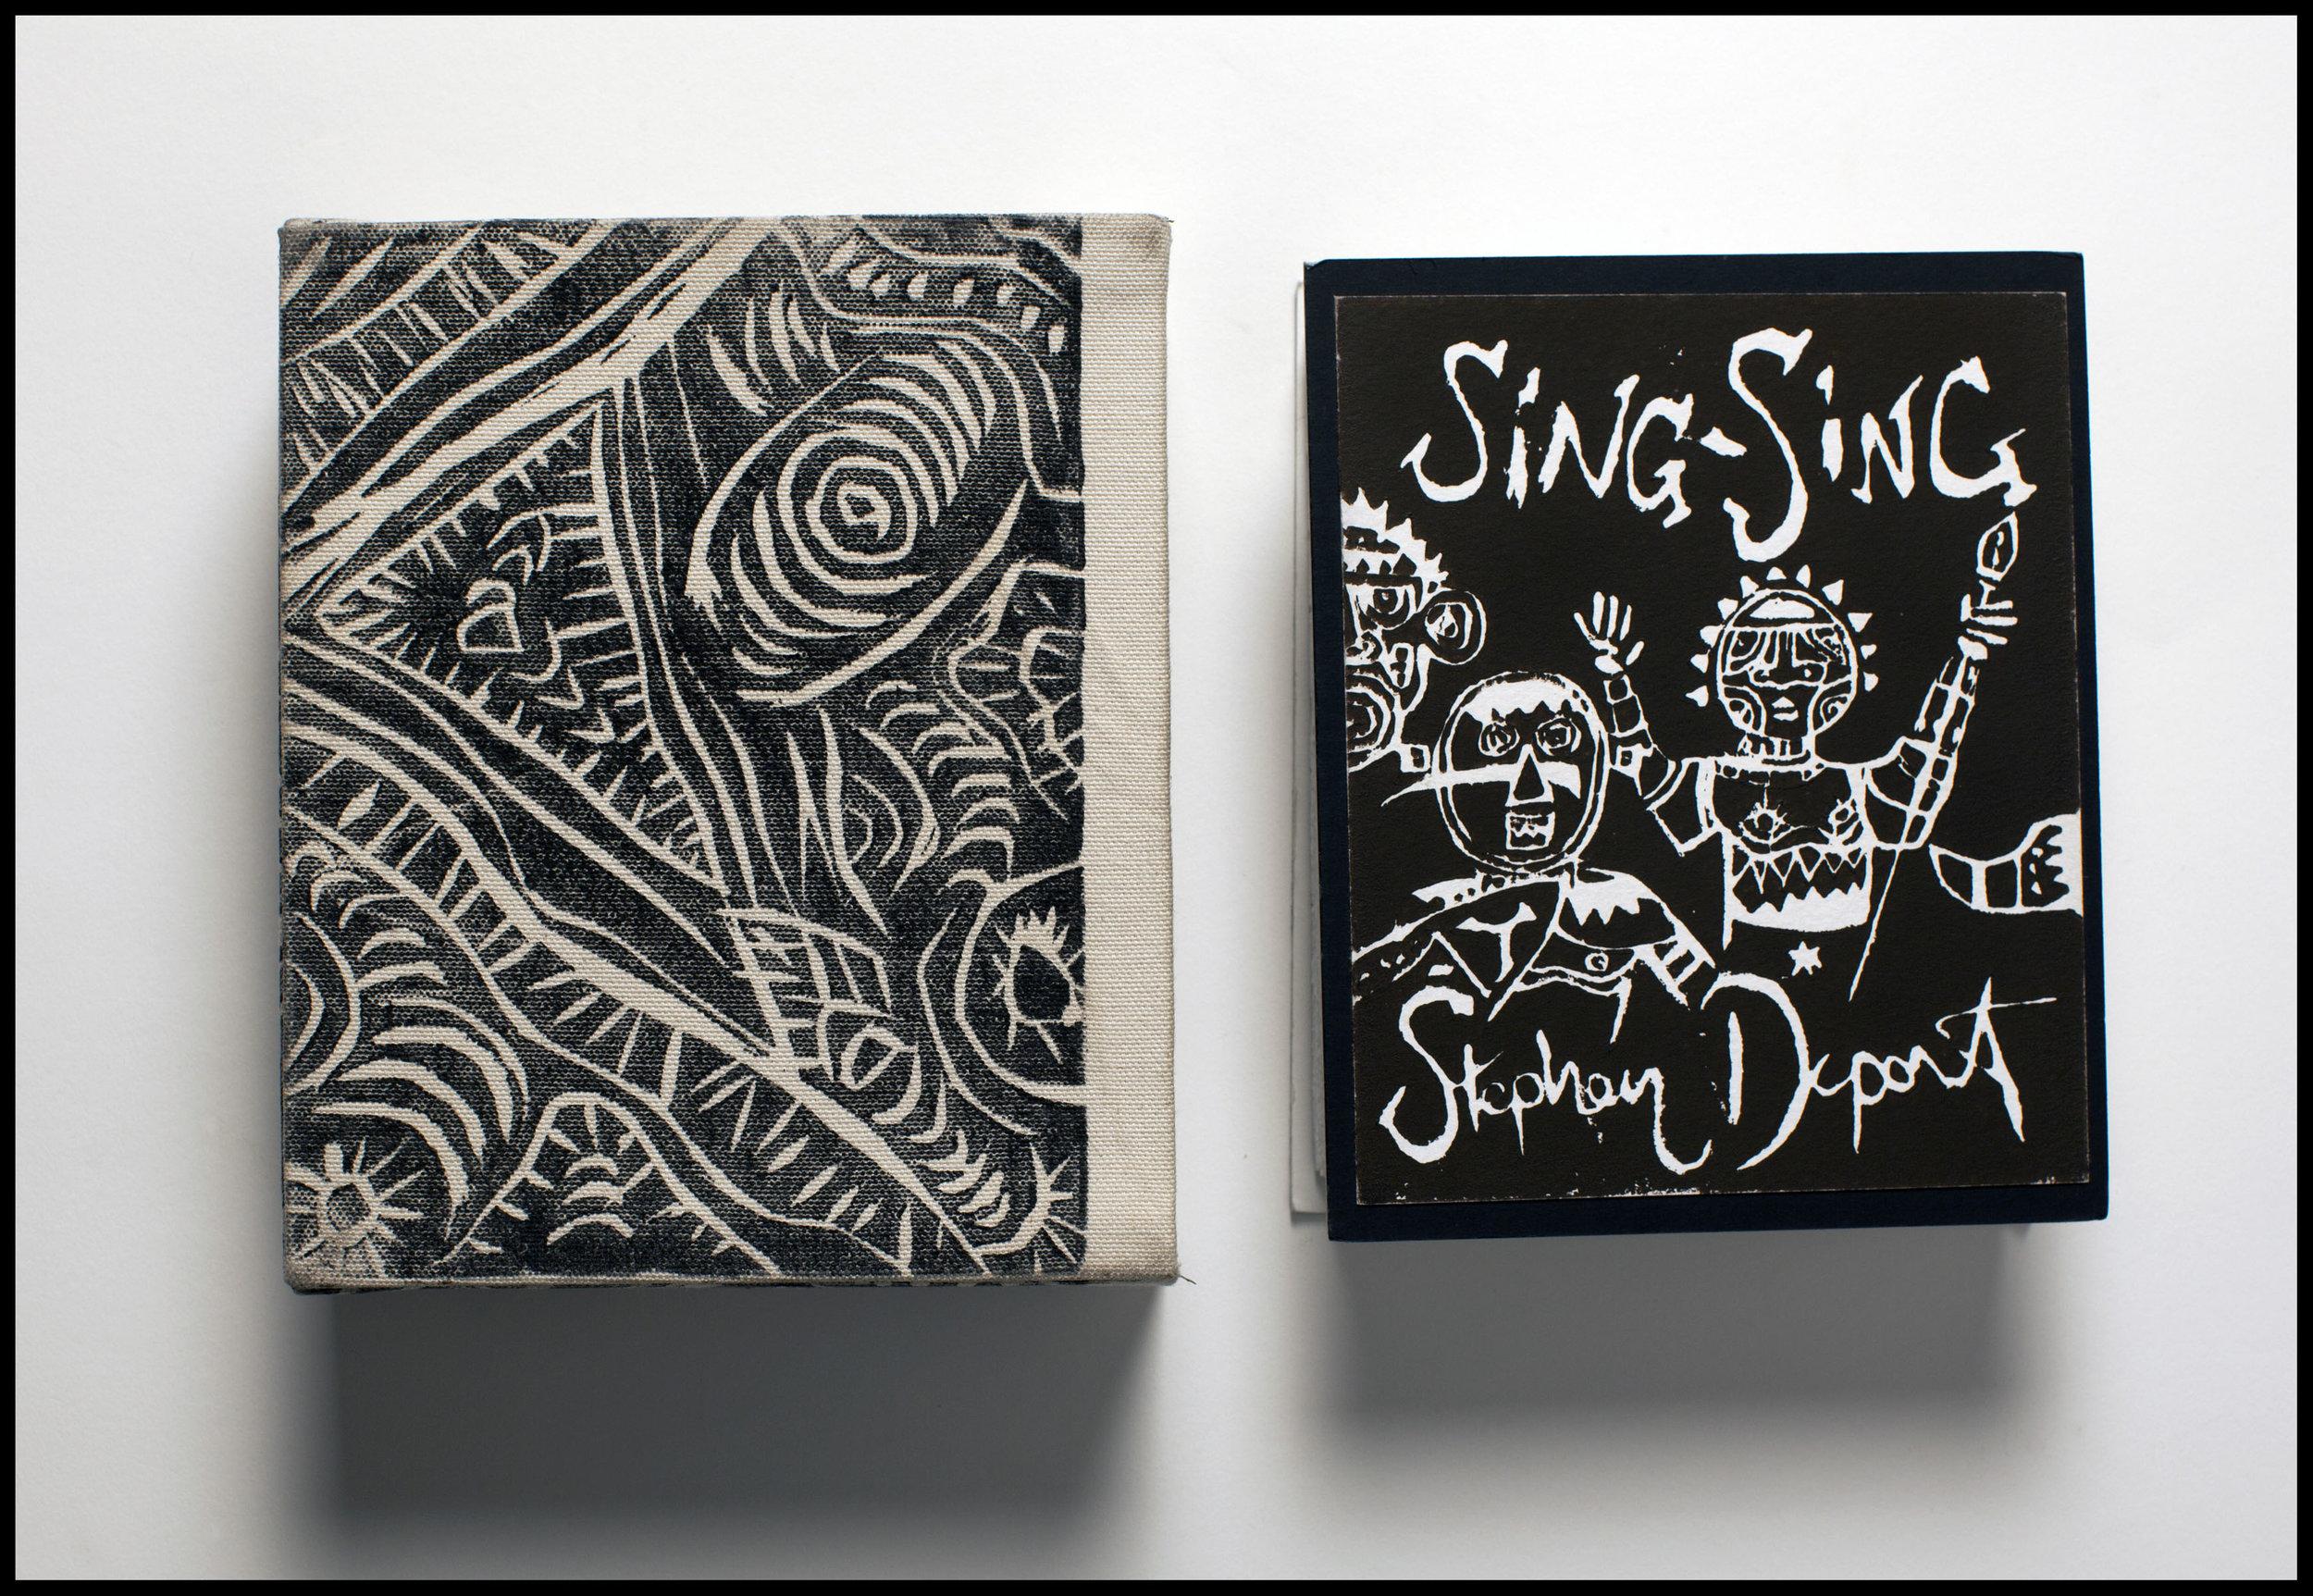 Sing_Sing_Artist_Book_13_02_2012_002.jpg